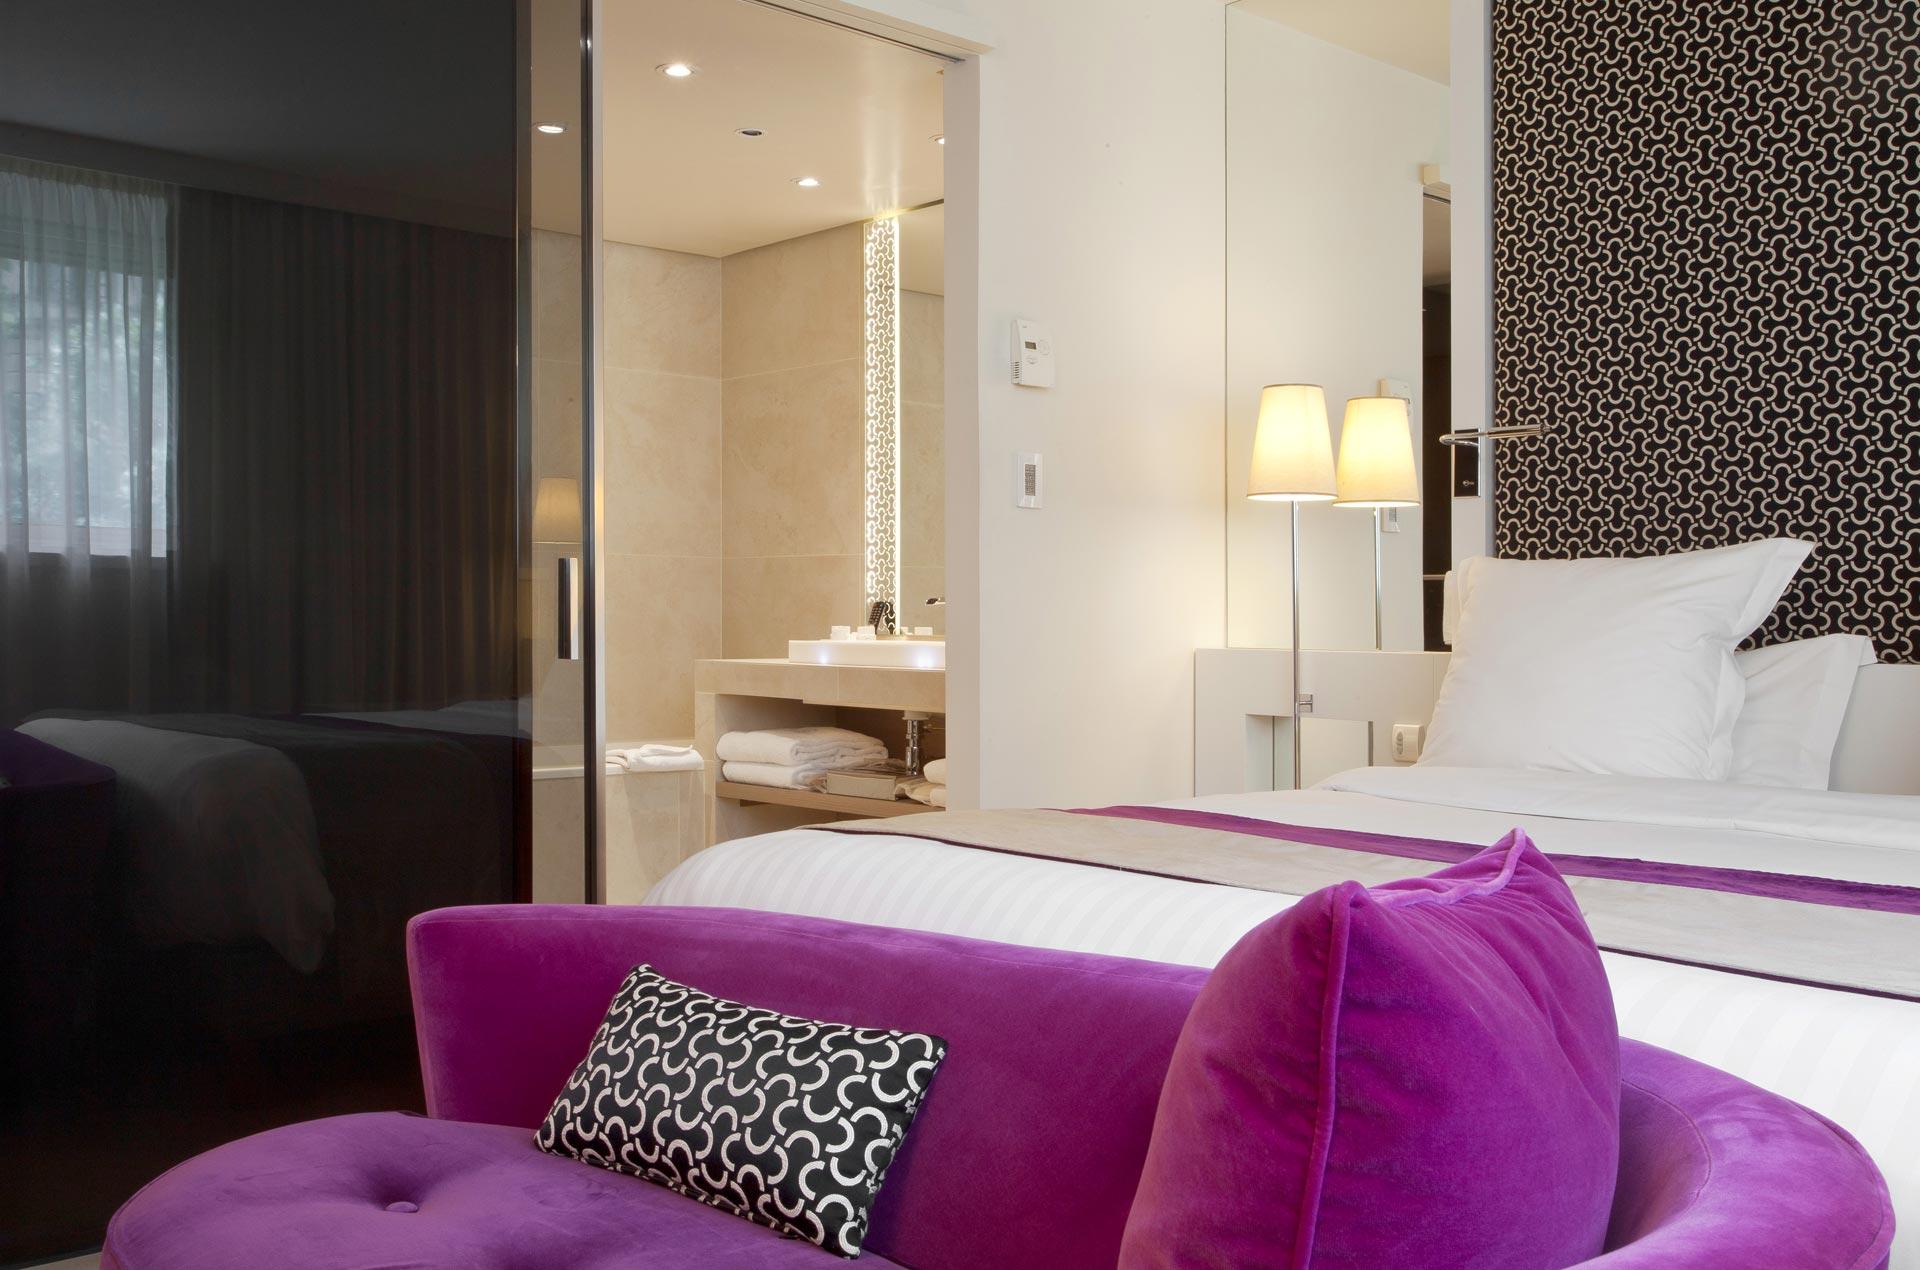 Chambre deluxe vue salle de bains la villa maillot spa for Chambre arbitrale de paris